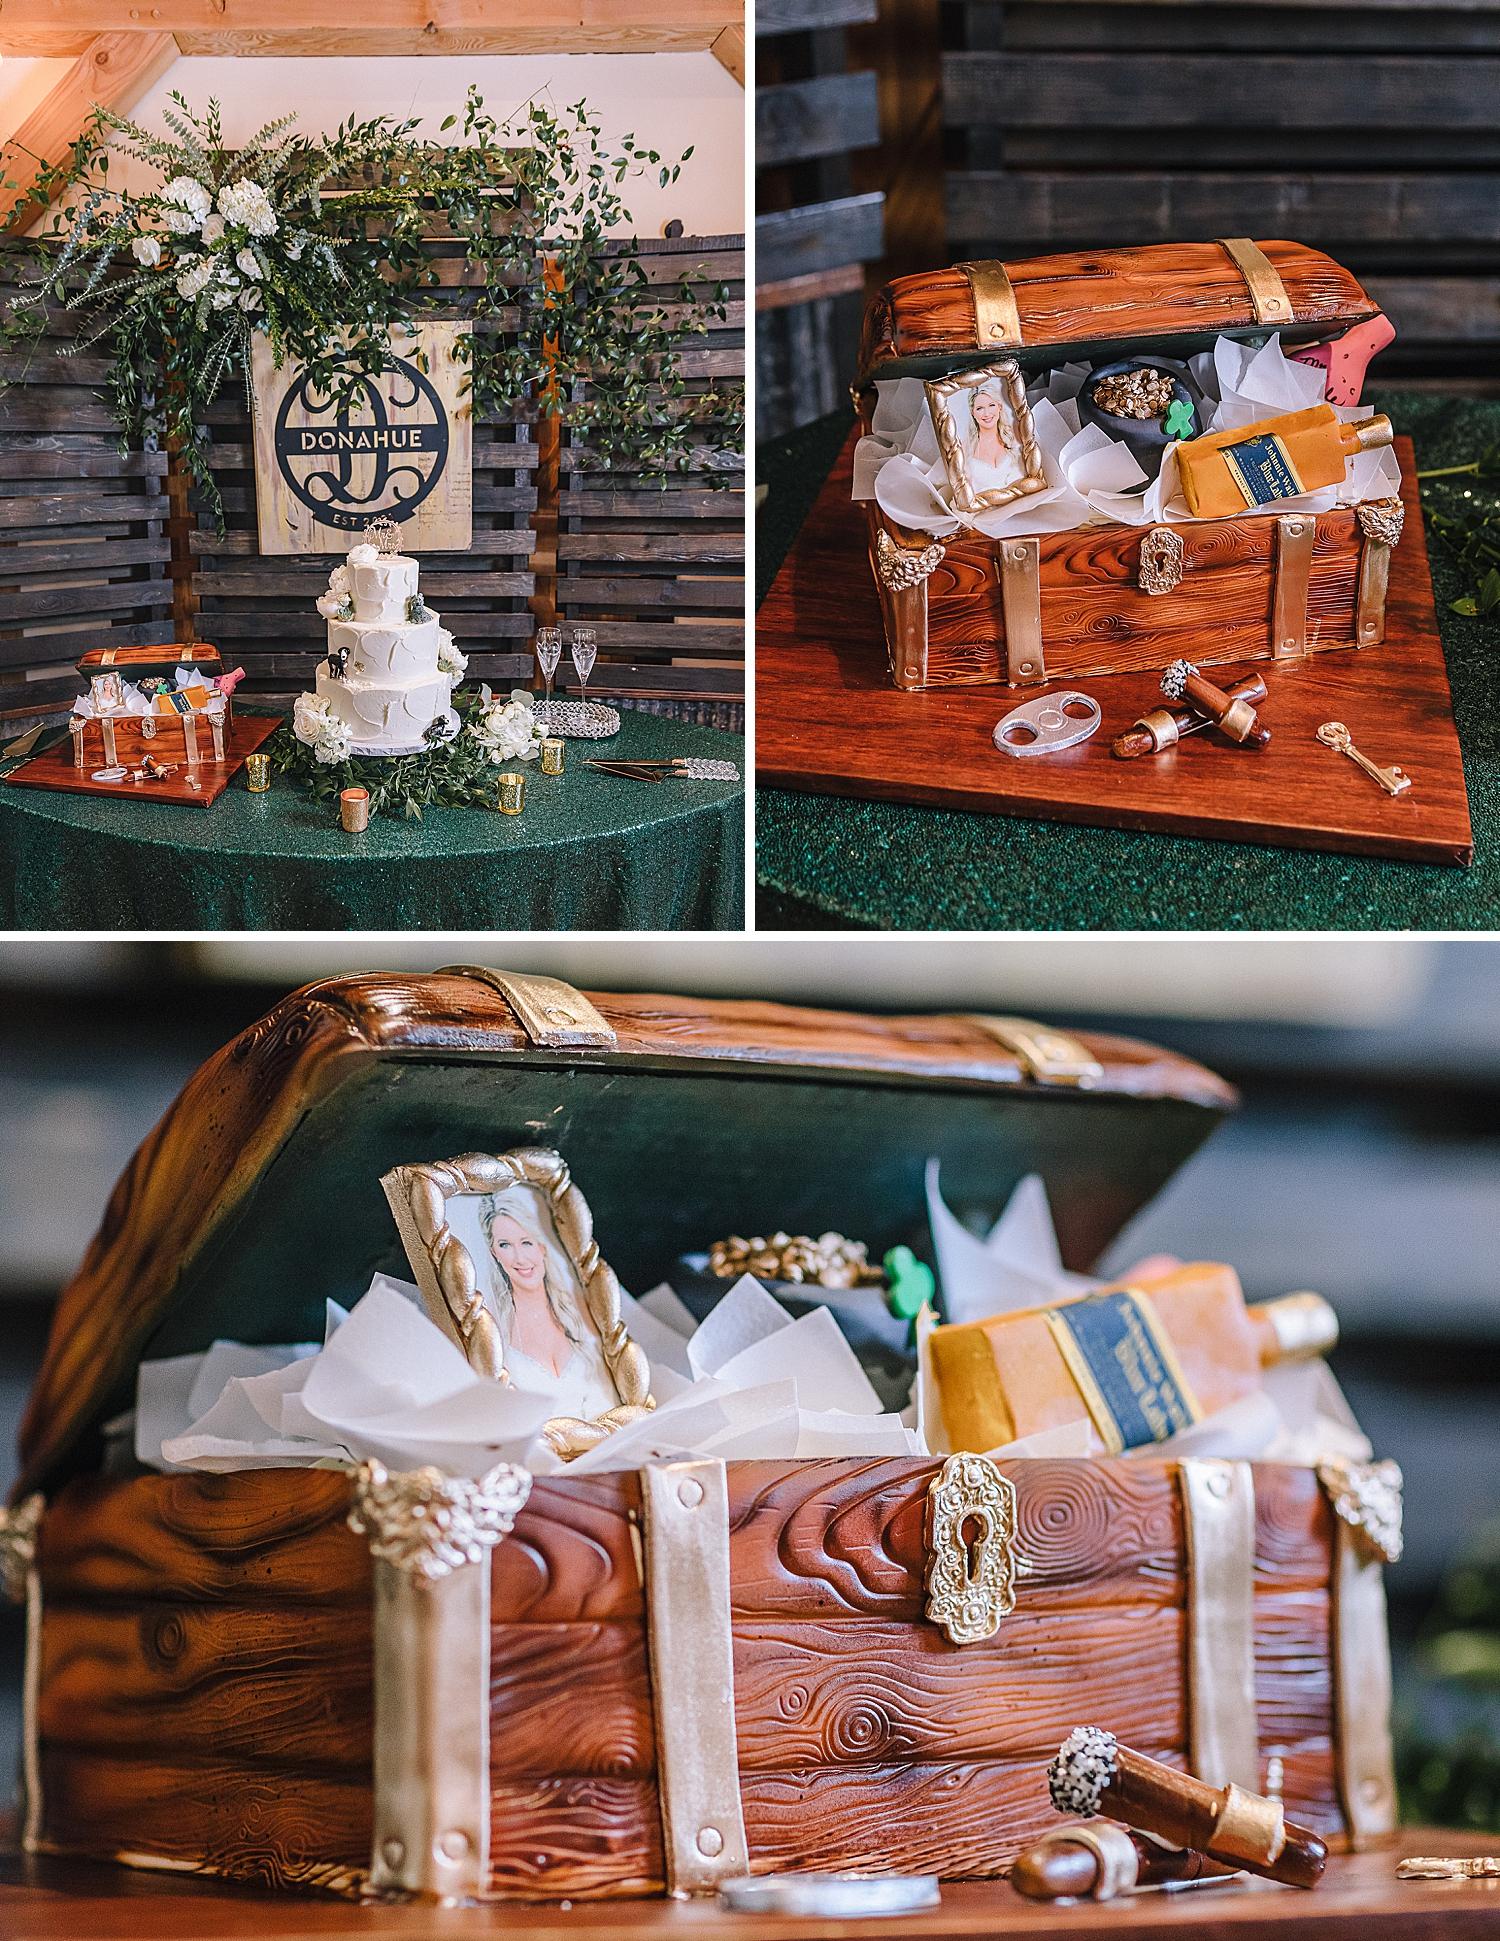 Magnolia-Halle-Wedding-San-Antonio-Texas-Bride-Grom_0009.jpg